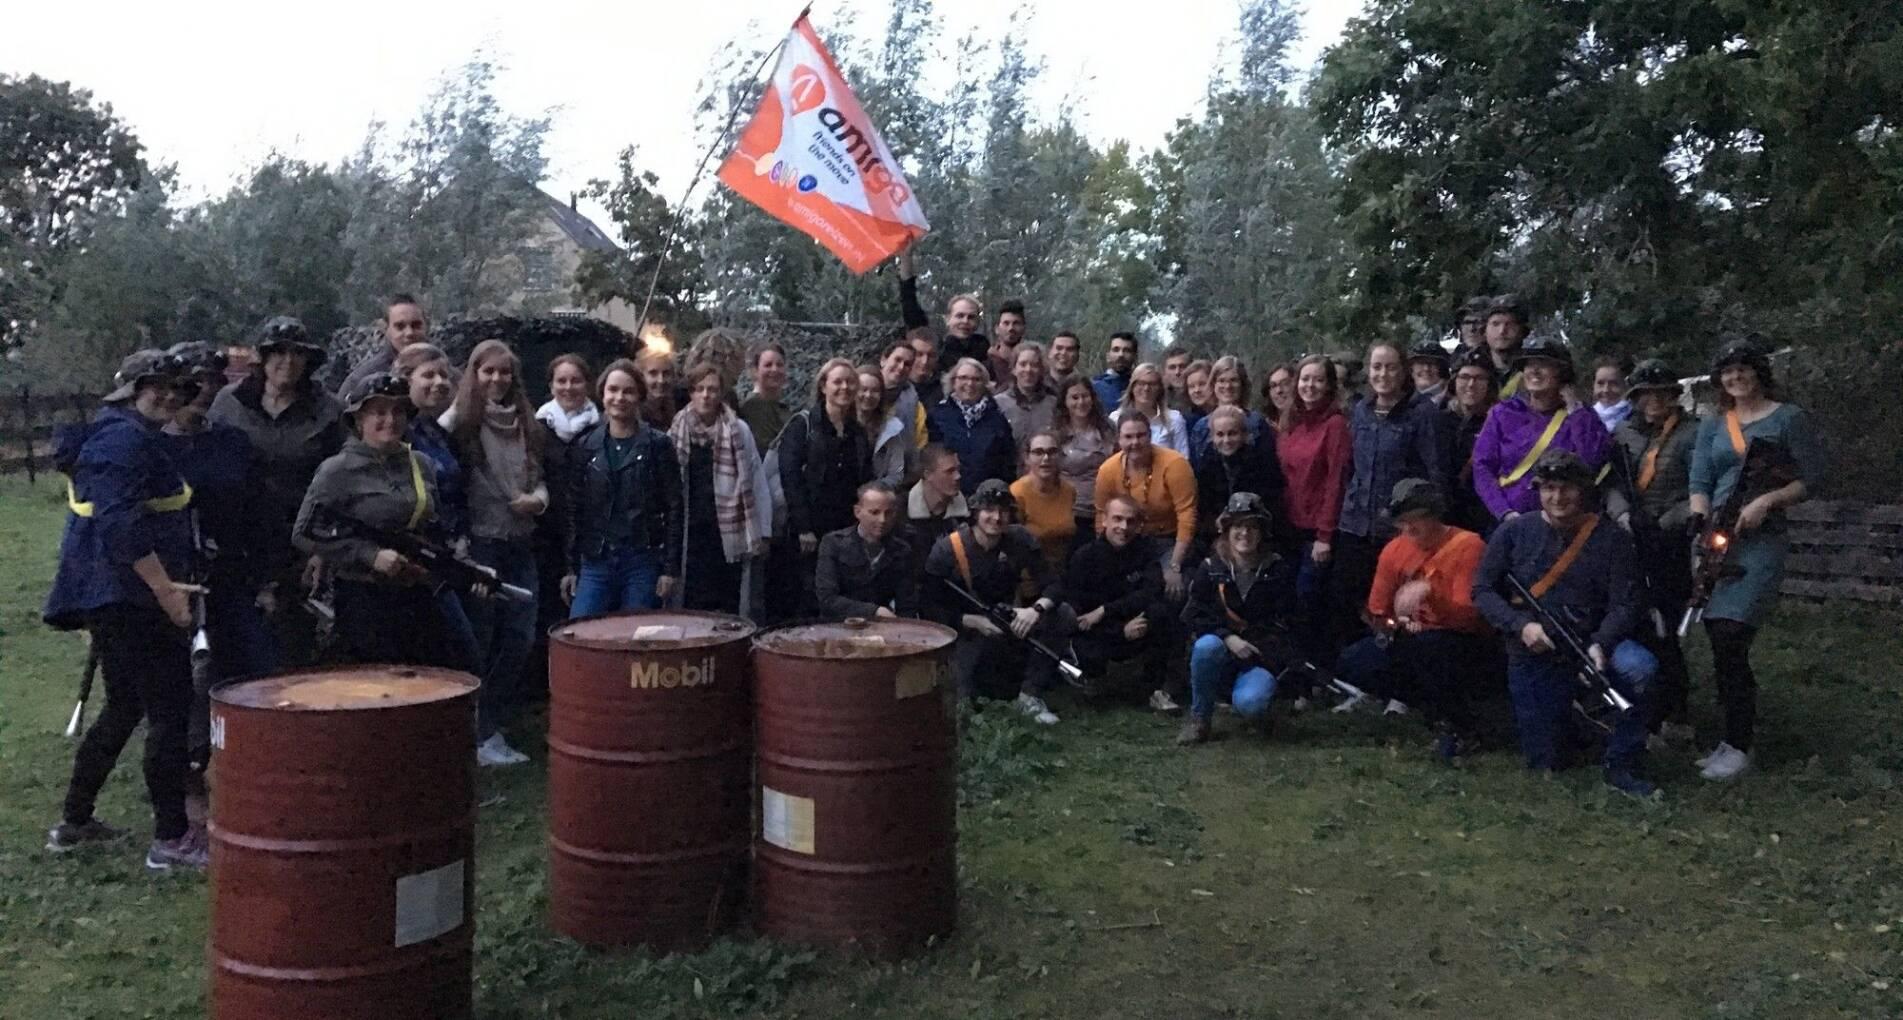 AmiGO Outdoor Lasergame Event - Nederland - 1